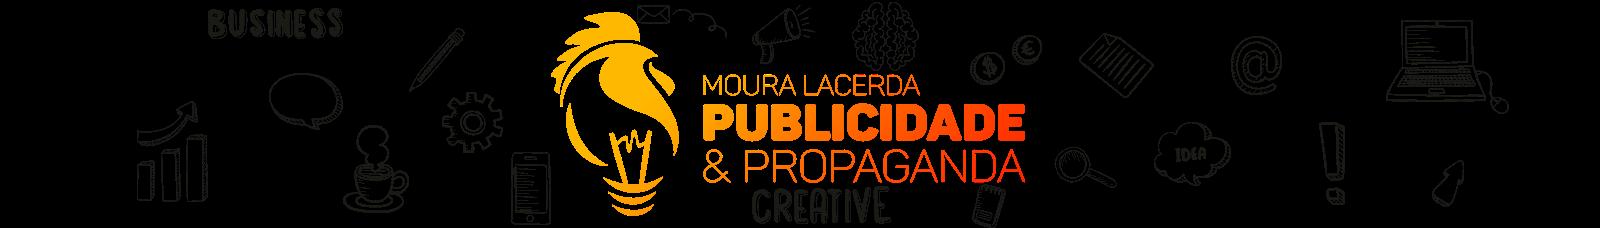 Blog da PP Moura Lacerda